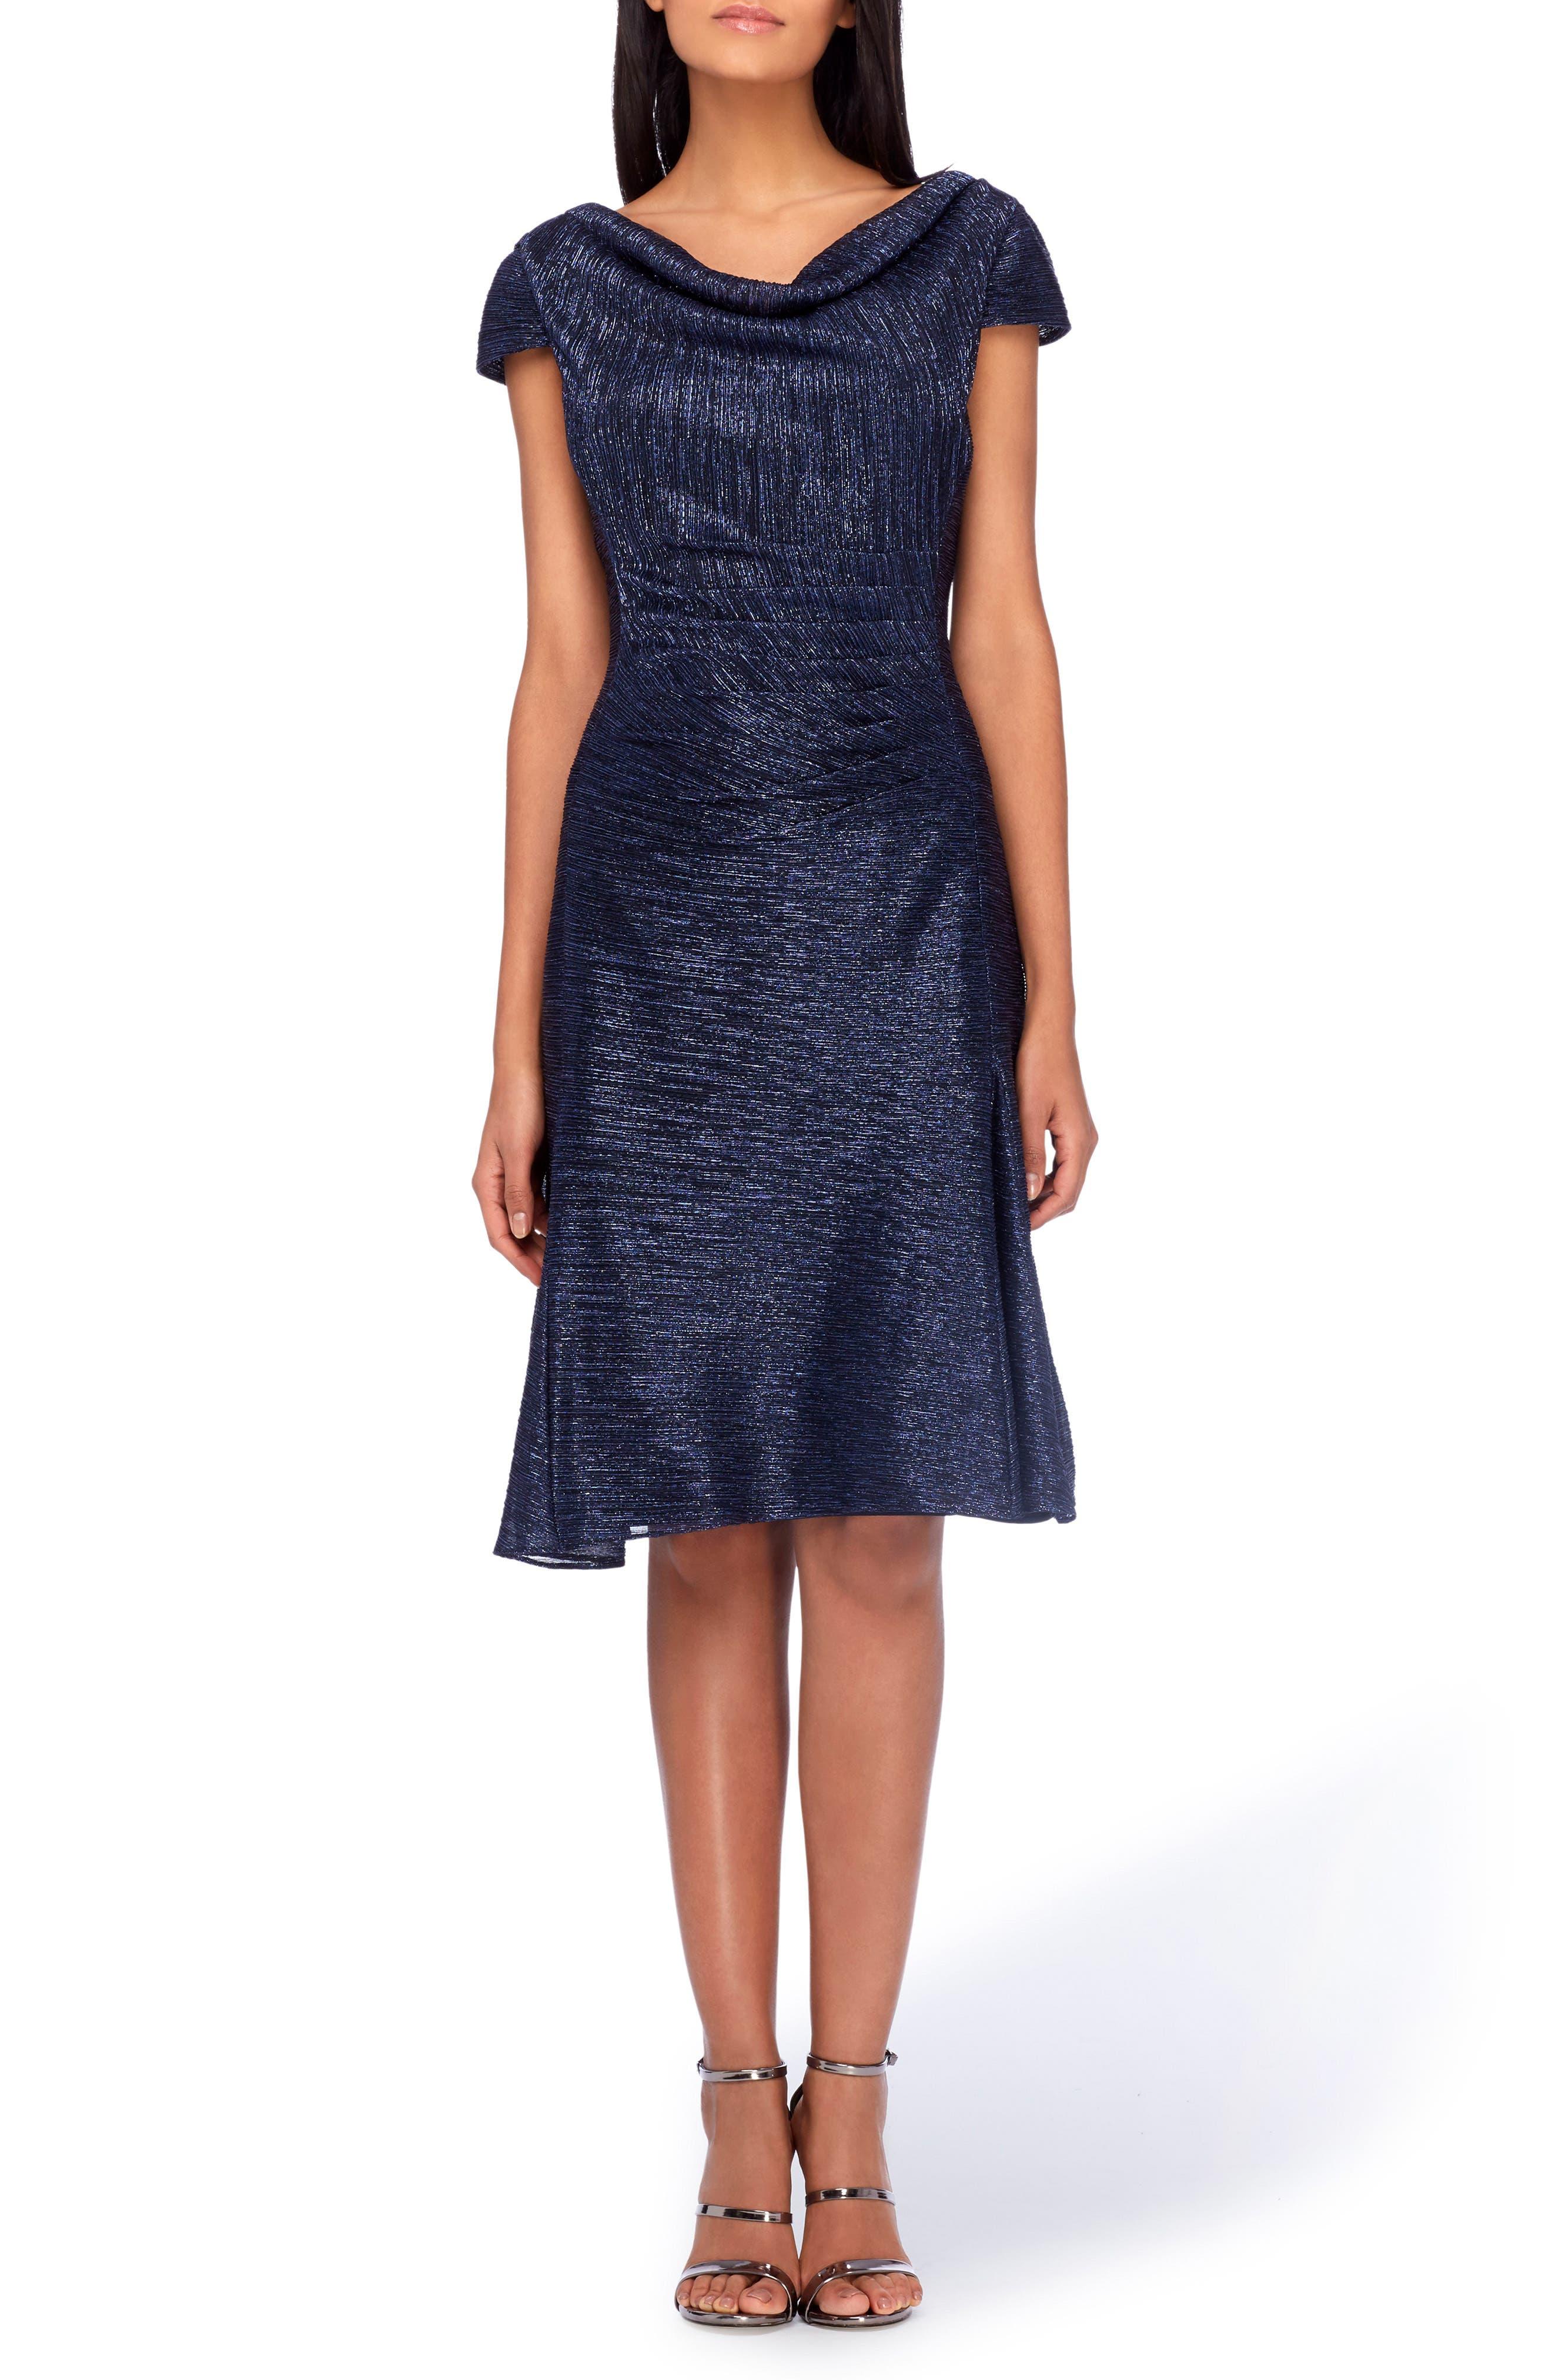 TAHARI Cowl Neck Fit & Flare Dress, Main, color, 412